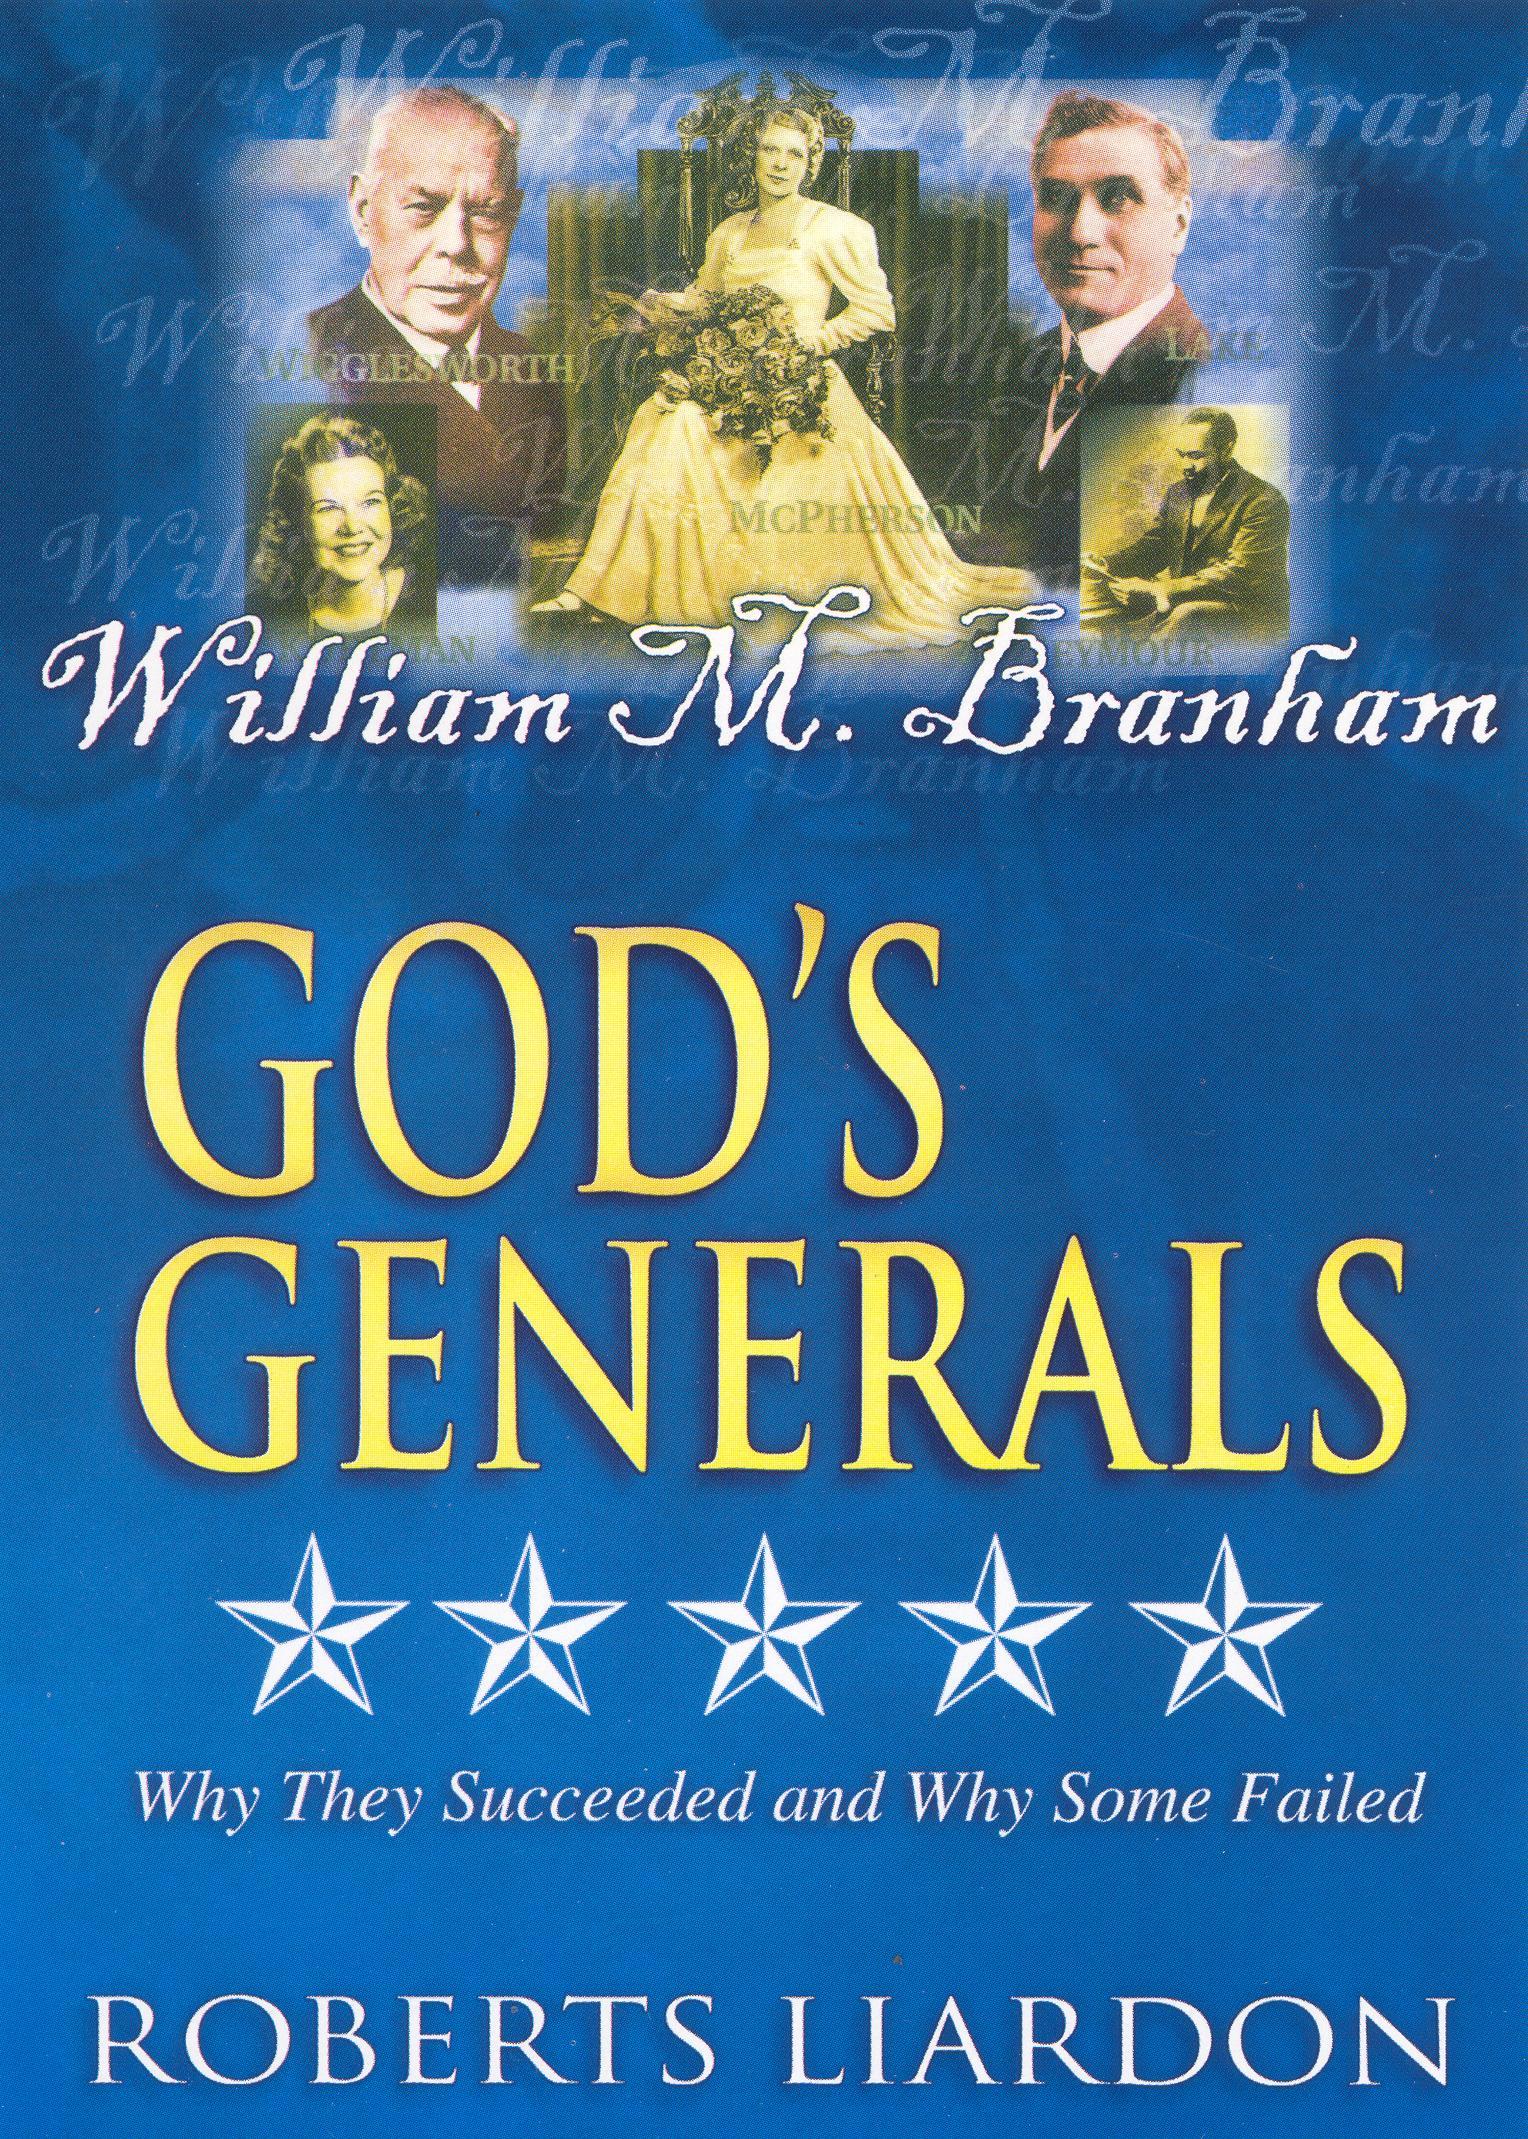 God's Generals: William M. Branham - Man of Notable Signs and Wonders